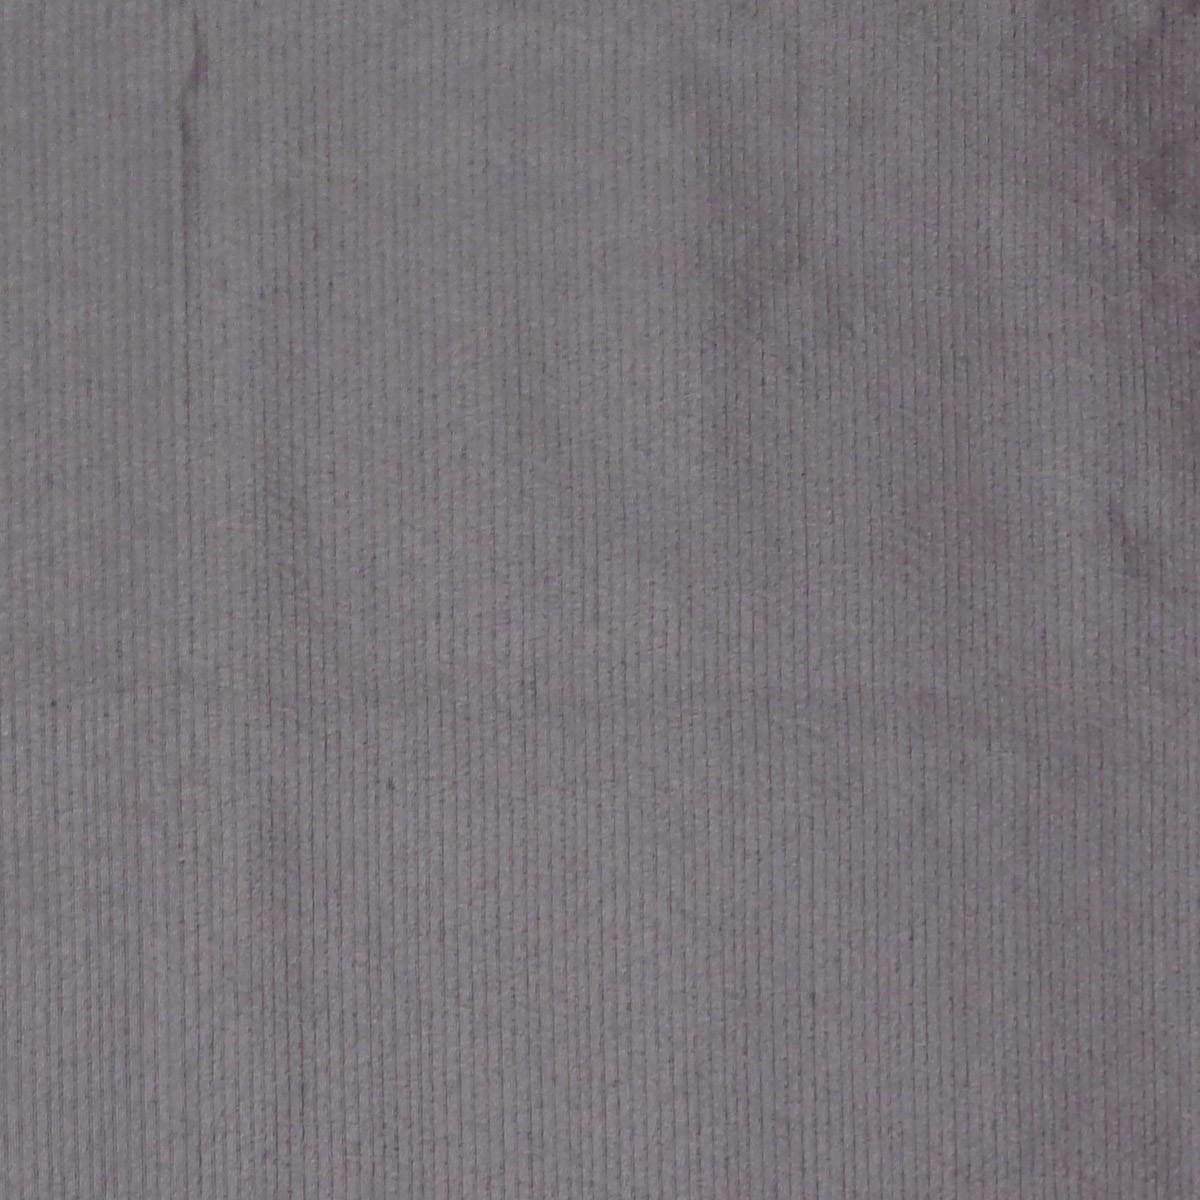 Cortina Para Sala Rústica Pantex Marrom Taupe 2,60 x 1,70 Bella Janela